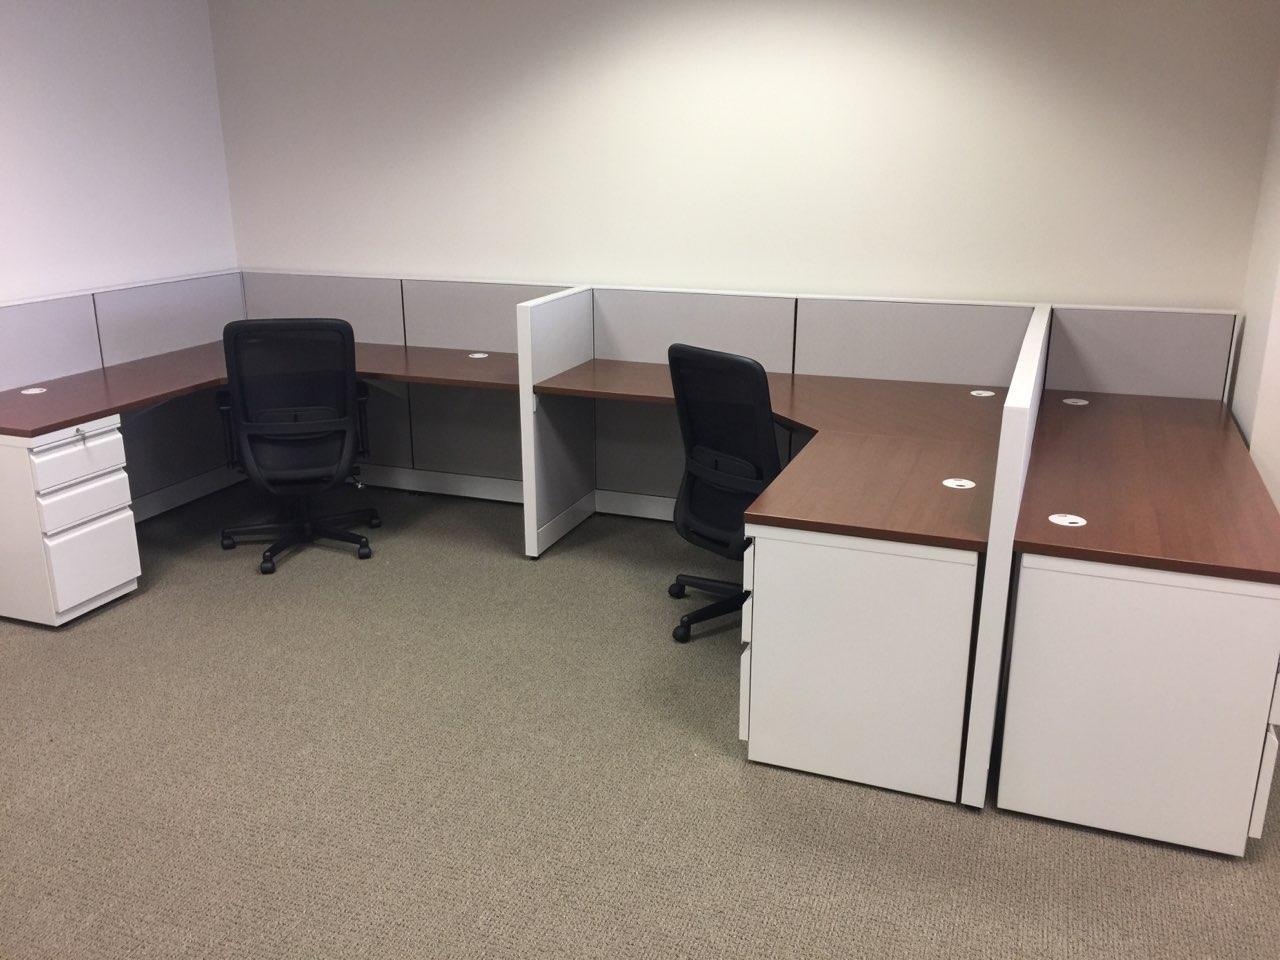 Hon Now QuickShip Workstations